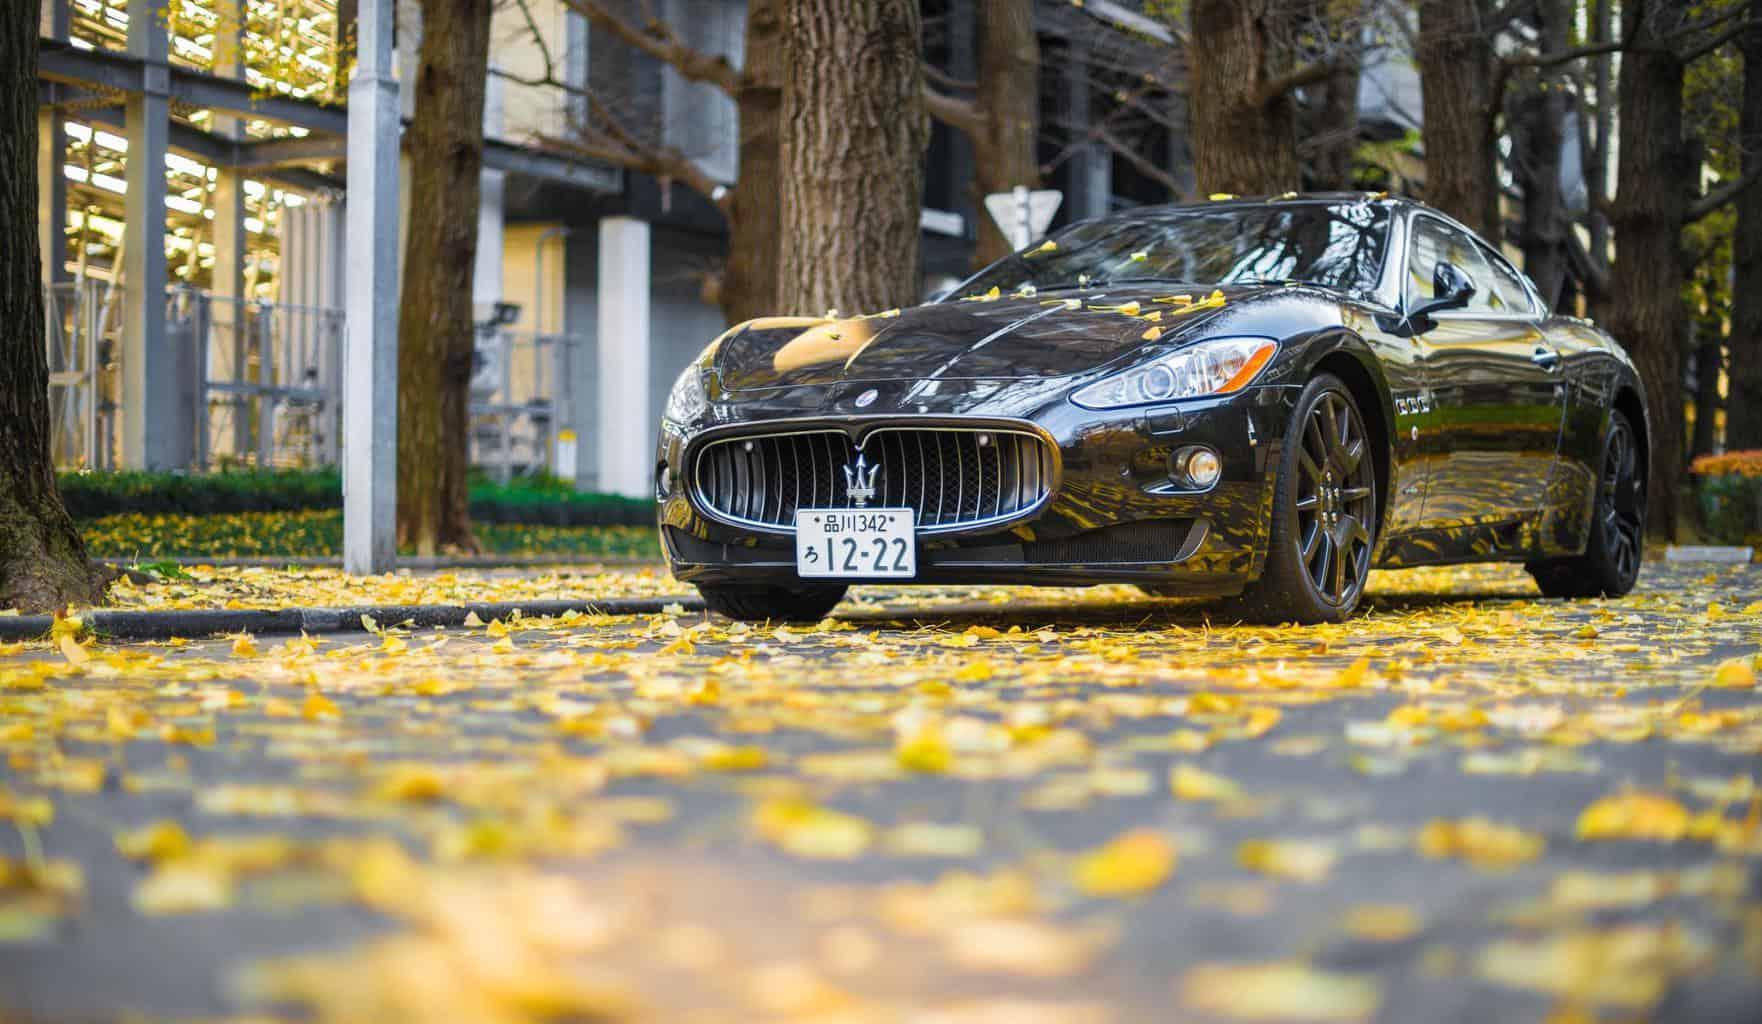 Maserati startet Elektrifizierung, investiert 800 Millionen Euro in Mirafiori